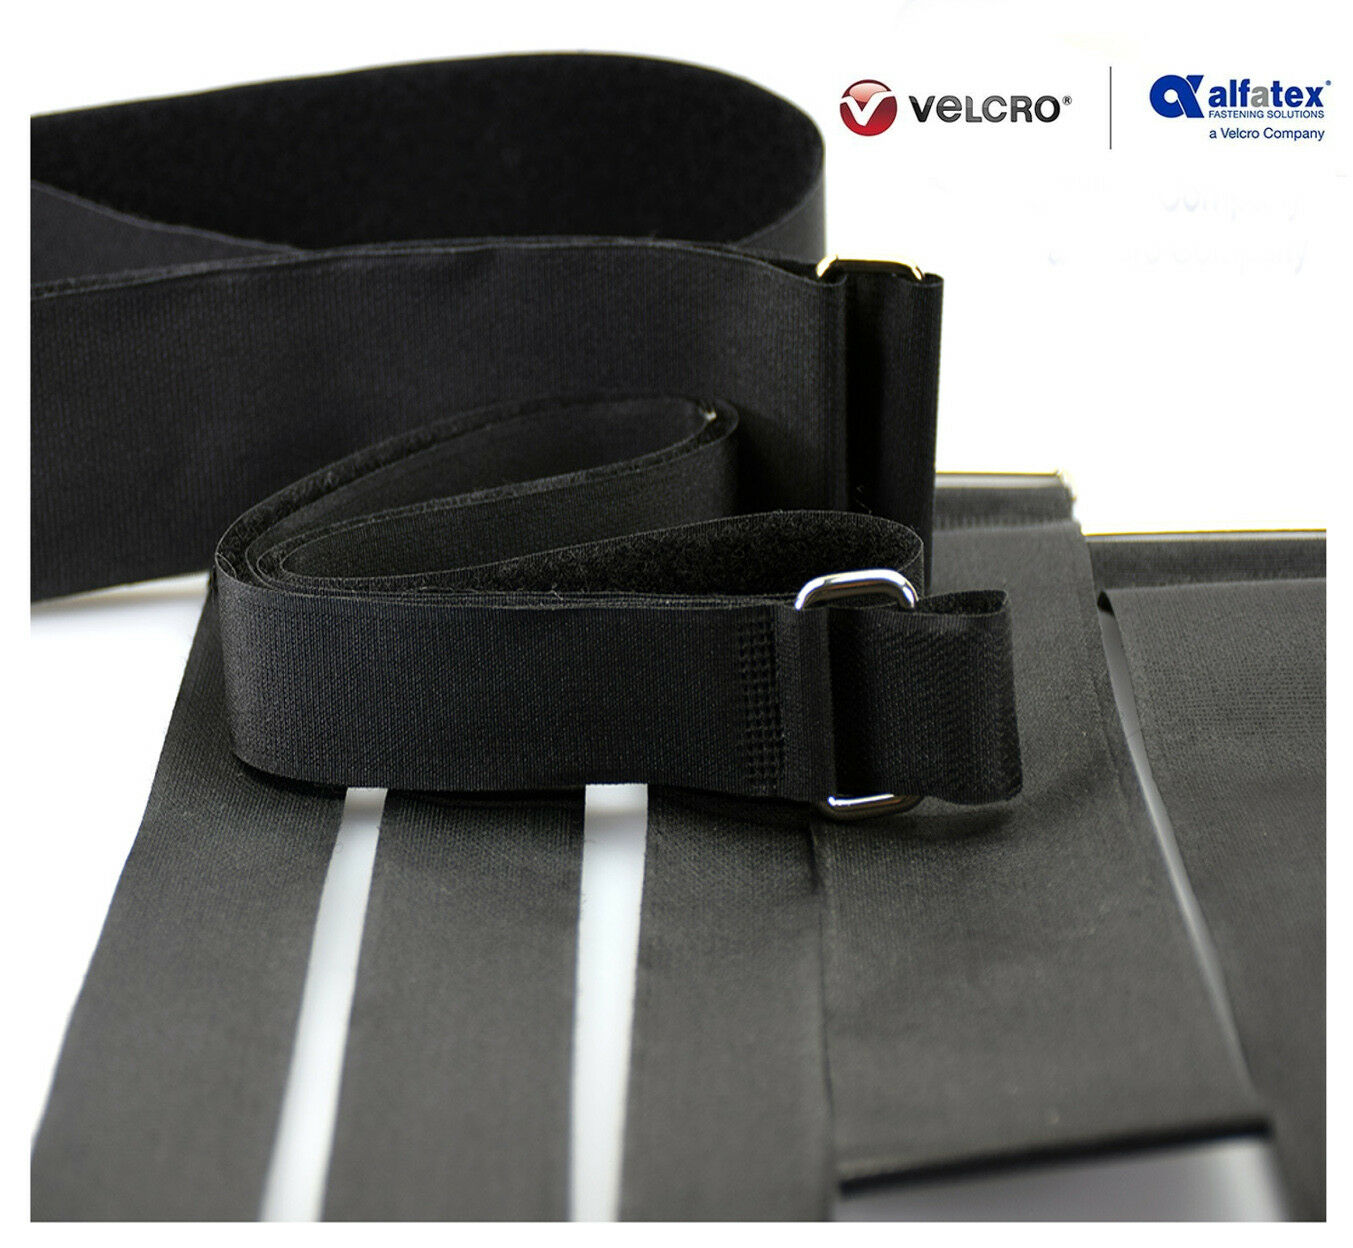 Alfatex 174 By Velcro 174 Brand Heavy Duty Metal Buckle